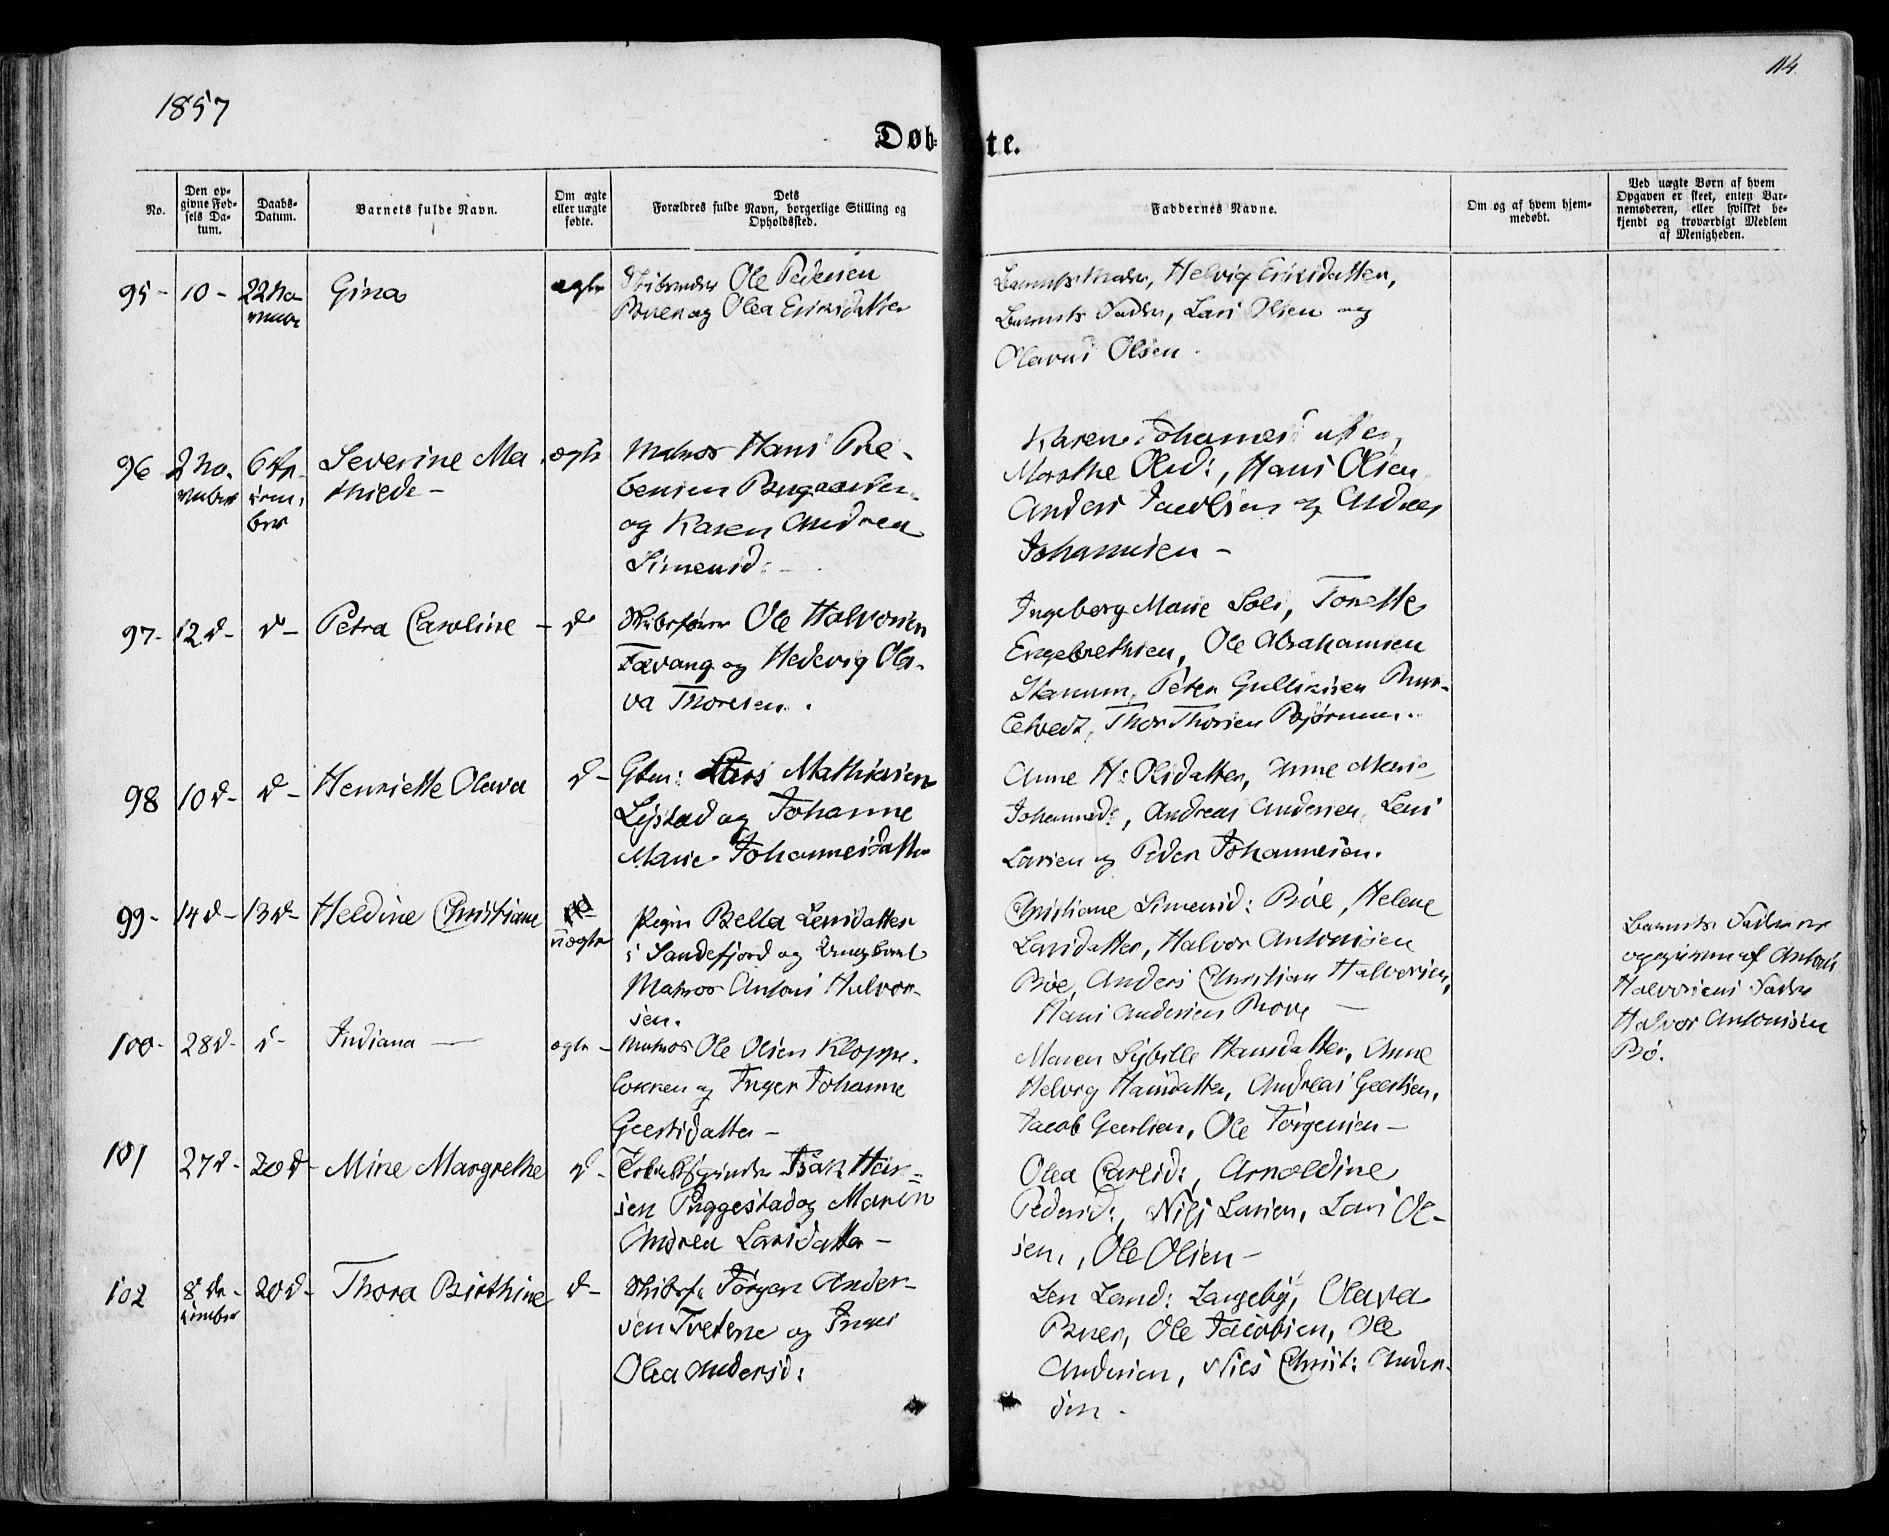 SAKO, Sandar kirkebøker, F/Fa/L0007: Parish register (official) no. 7, 1855-1861, p. 114